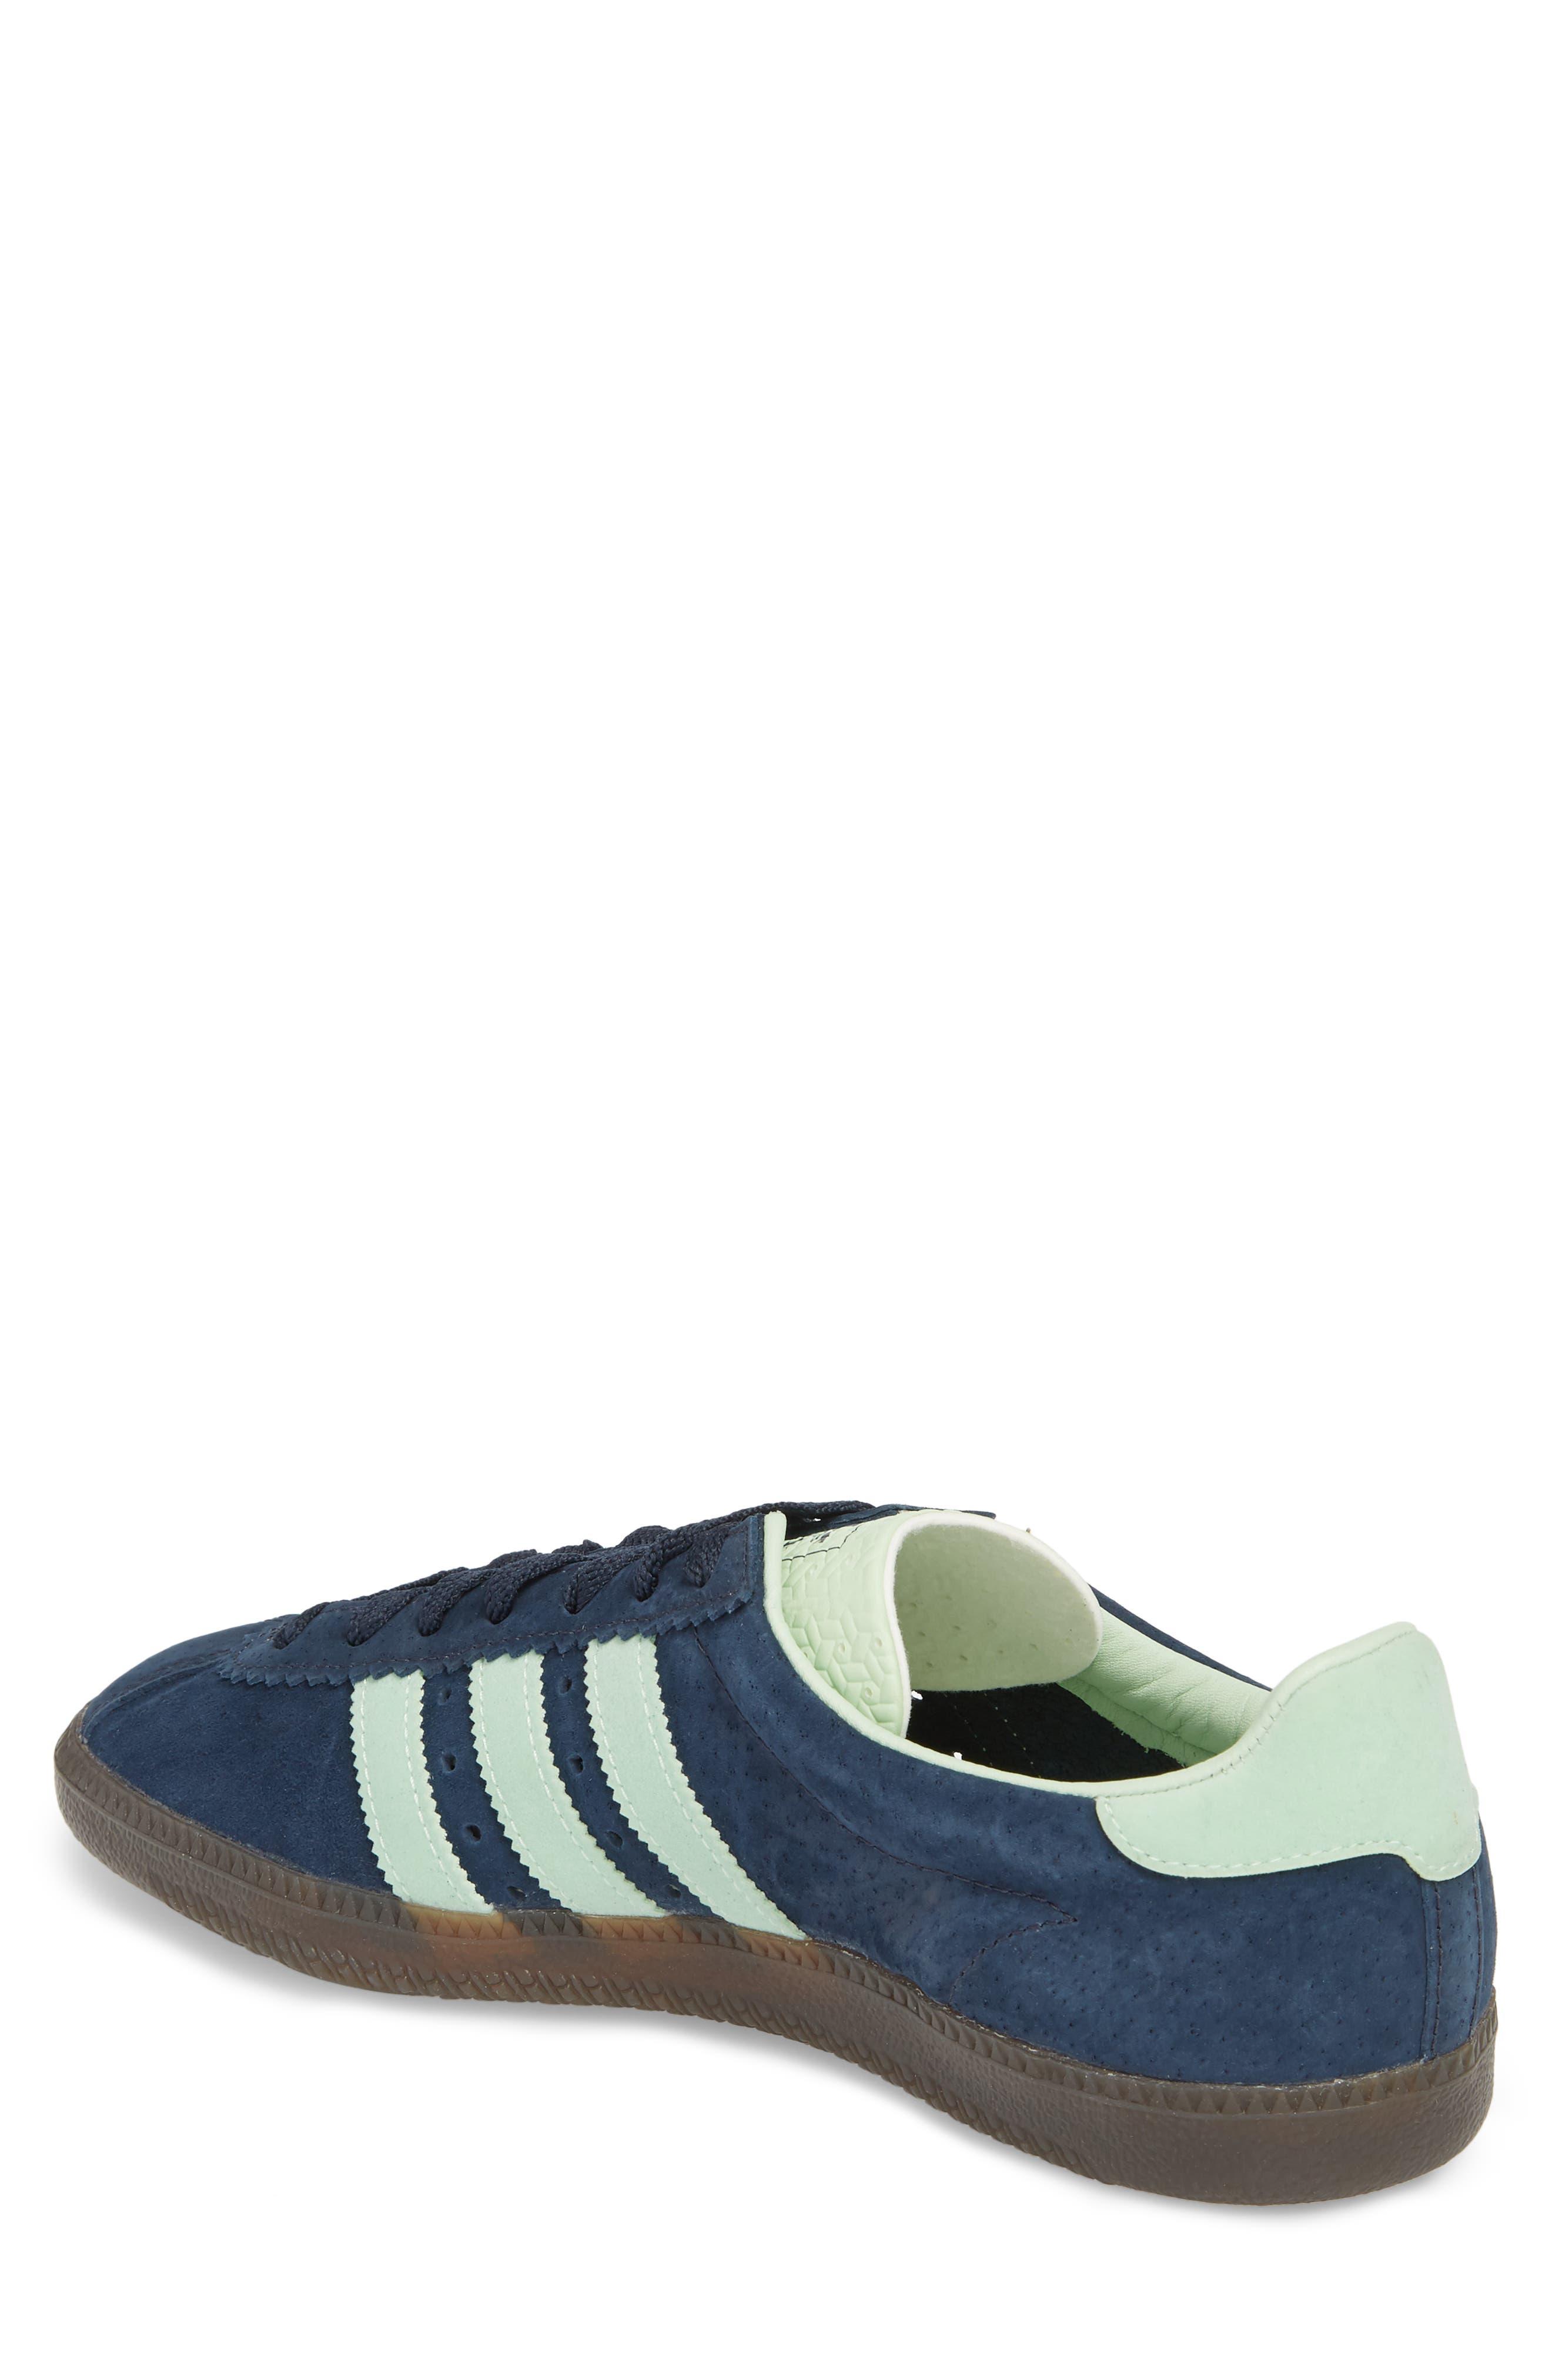 Padiham SPZL Sneaker,                             Alternate thumbnail 2, color,                             NIGHT NAVY